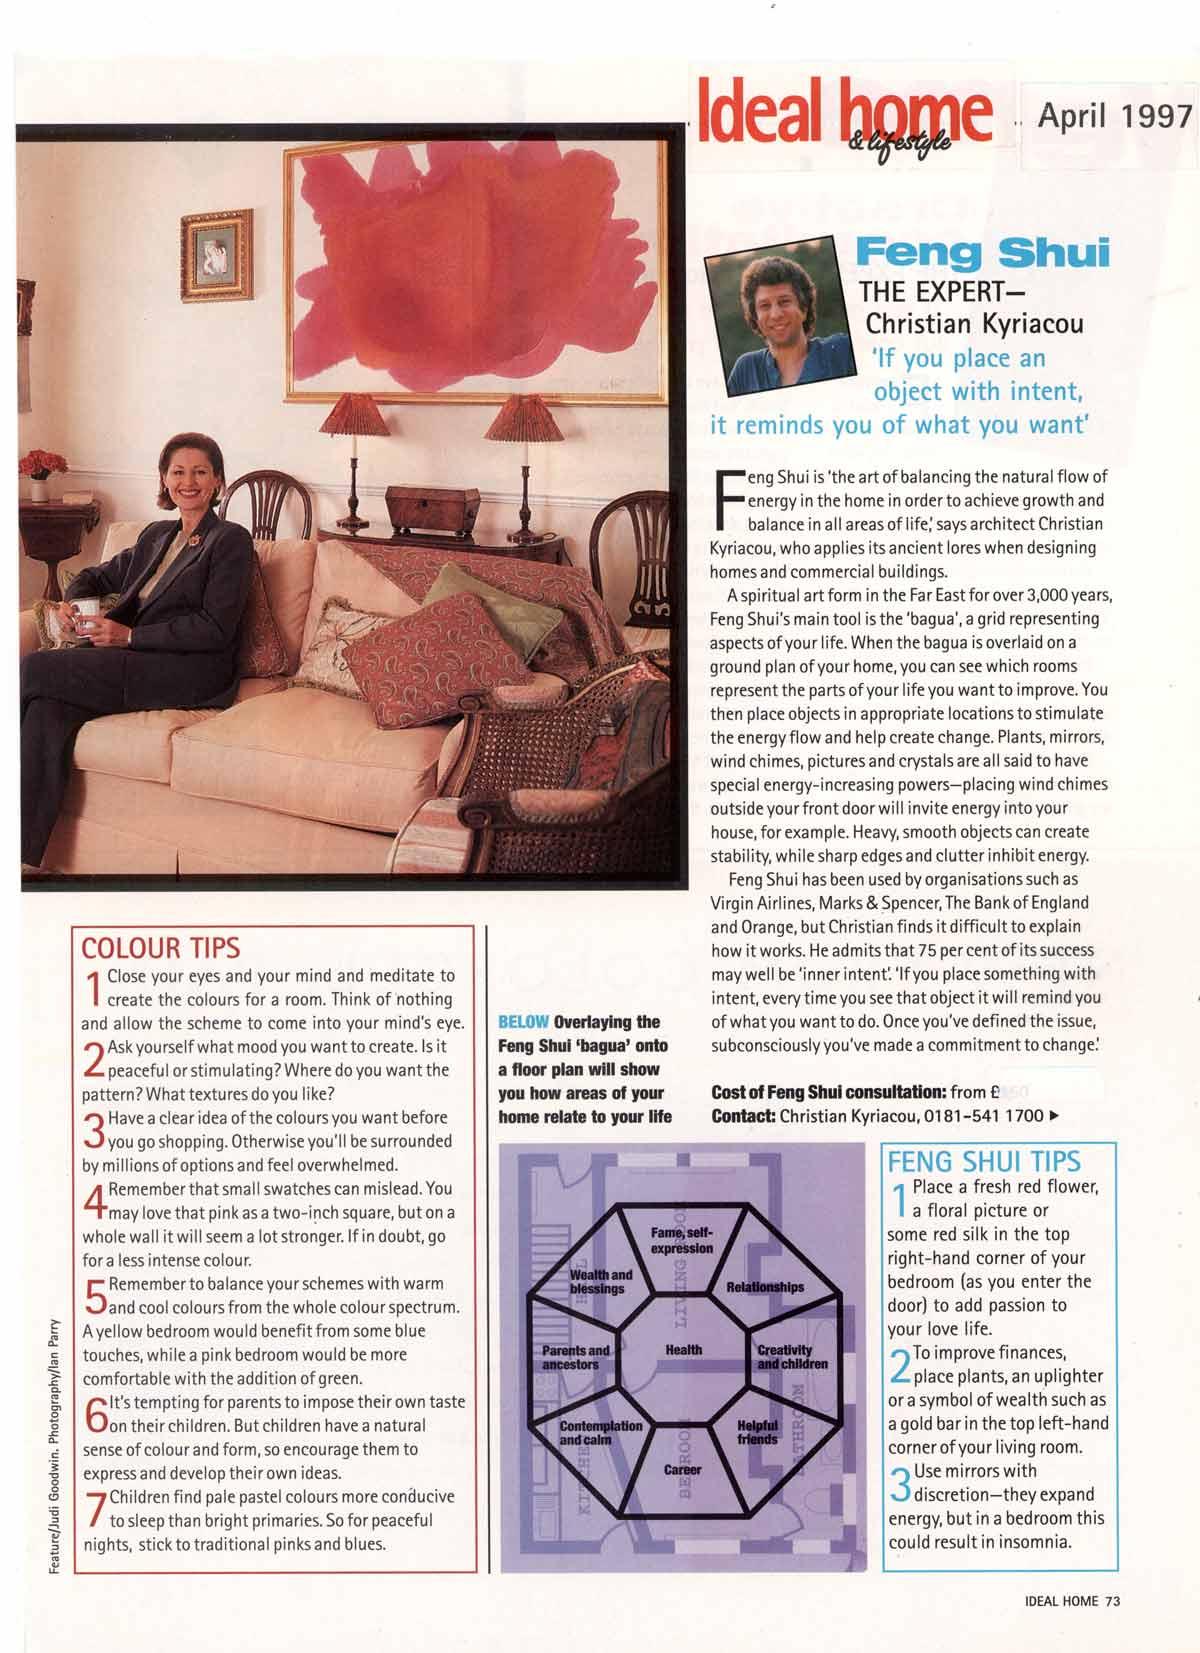 Ideal-Home-1997-April.jpg